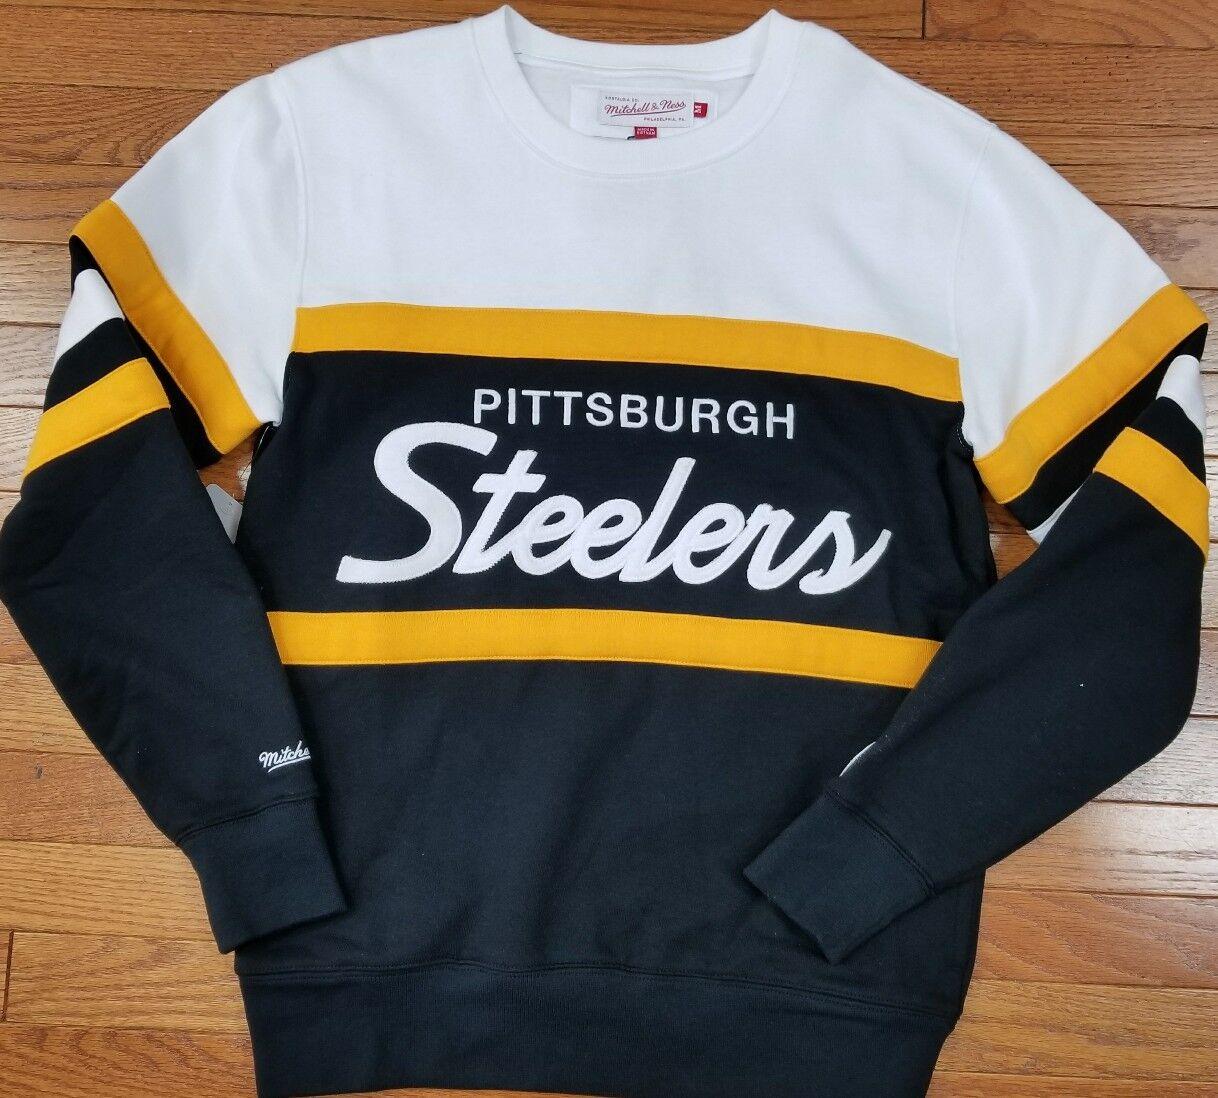 4a71d48b Details about Pittsburgh Steelers Mitchell & Ness NFL Men's Head Coach Crew  Sweatshirt Black